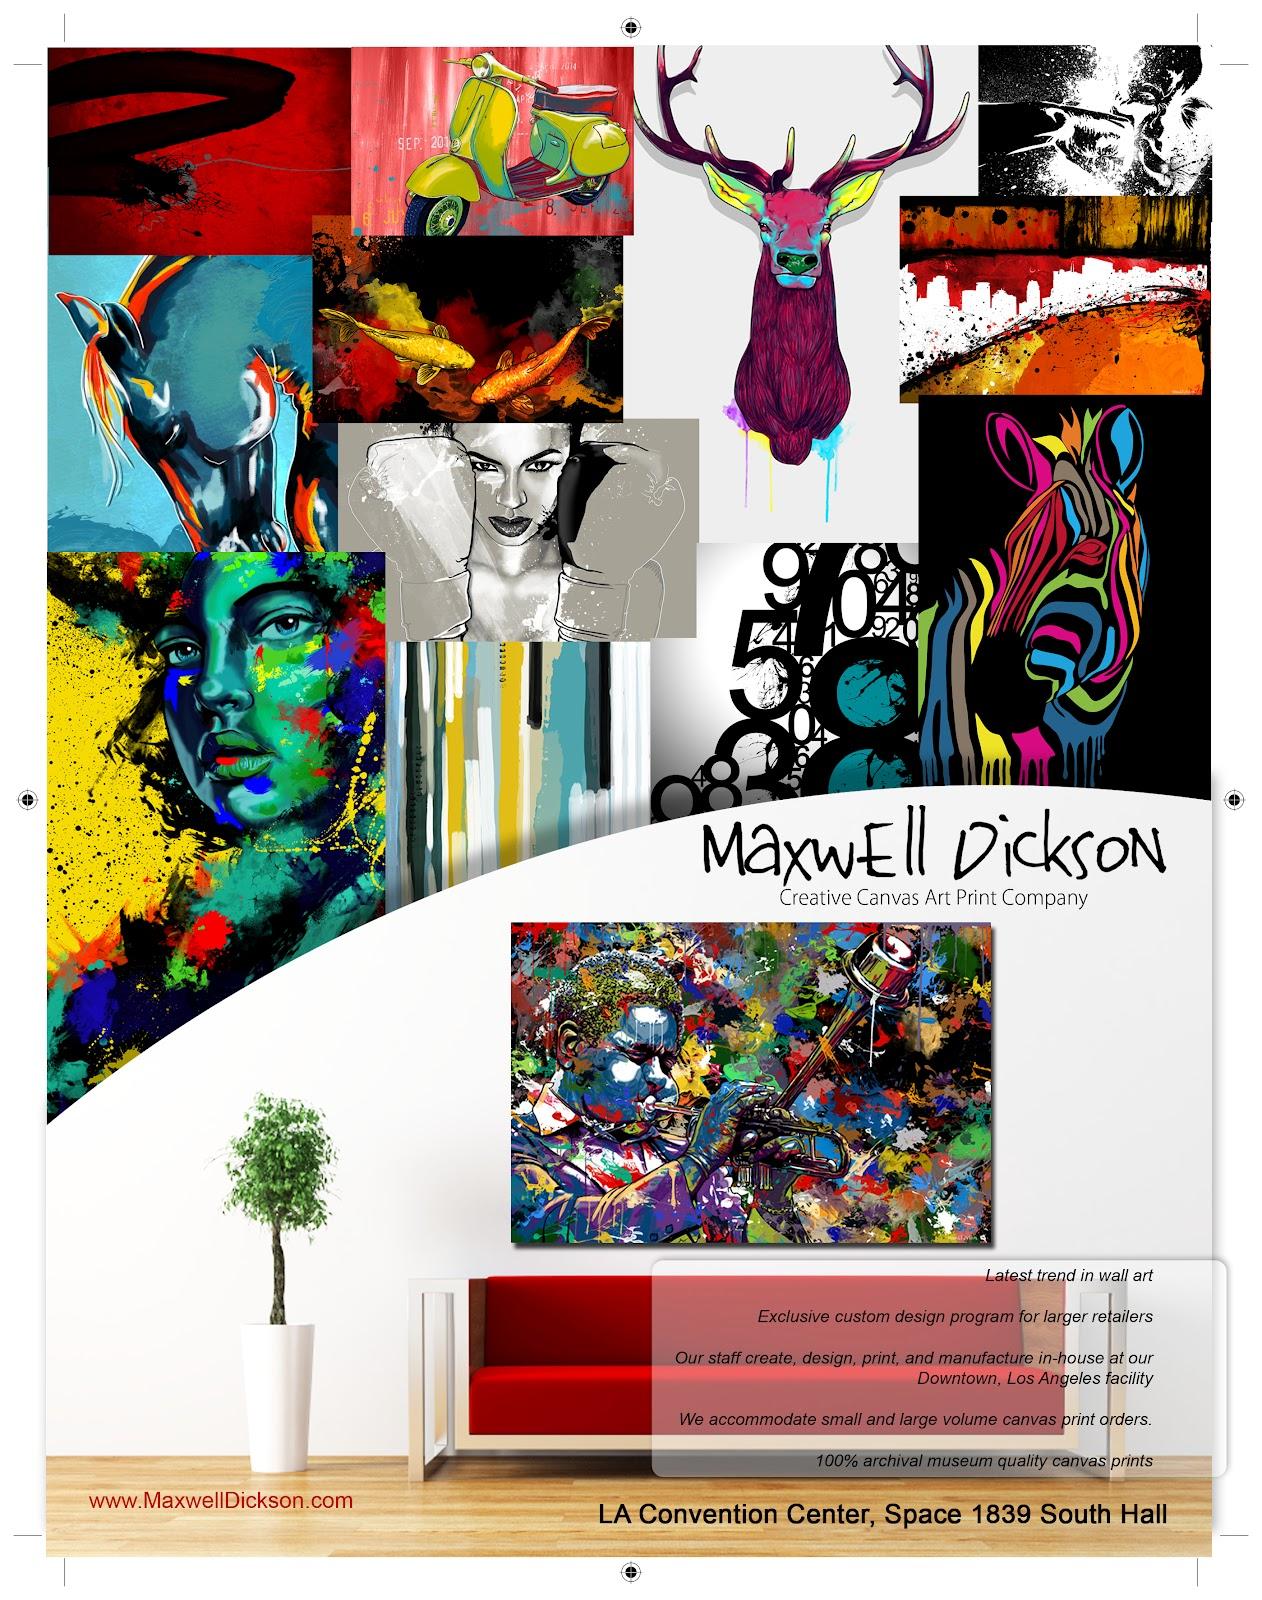 Maxwell Dickson